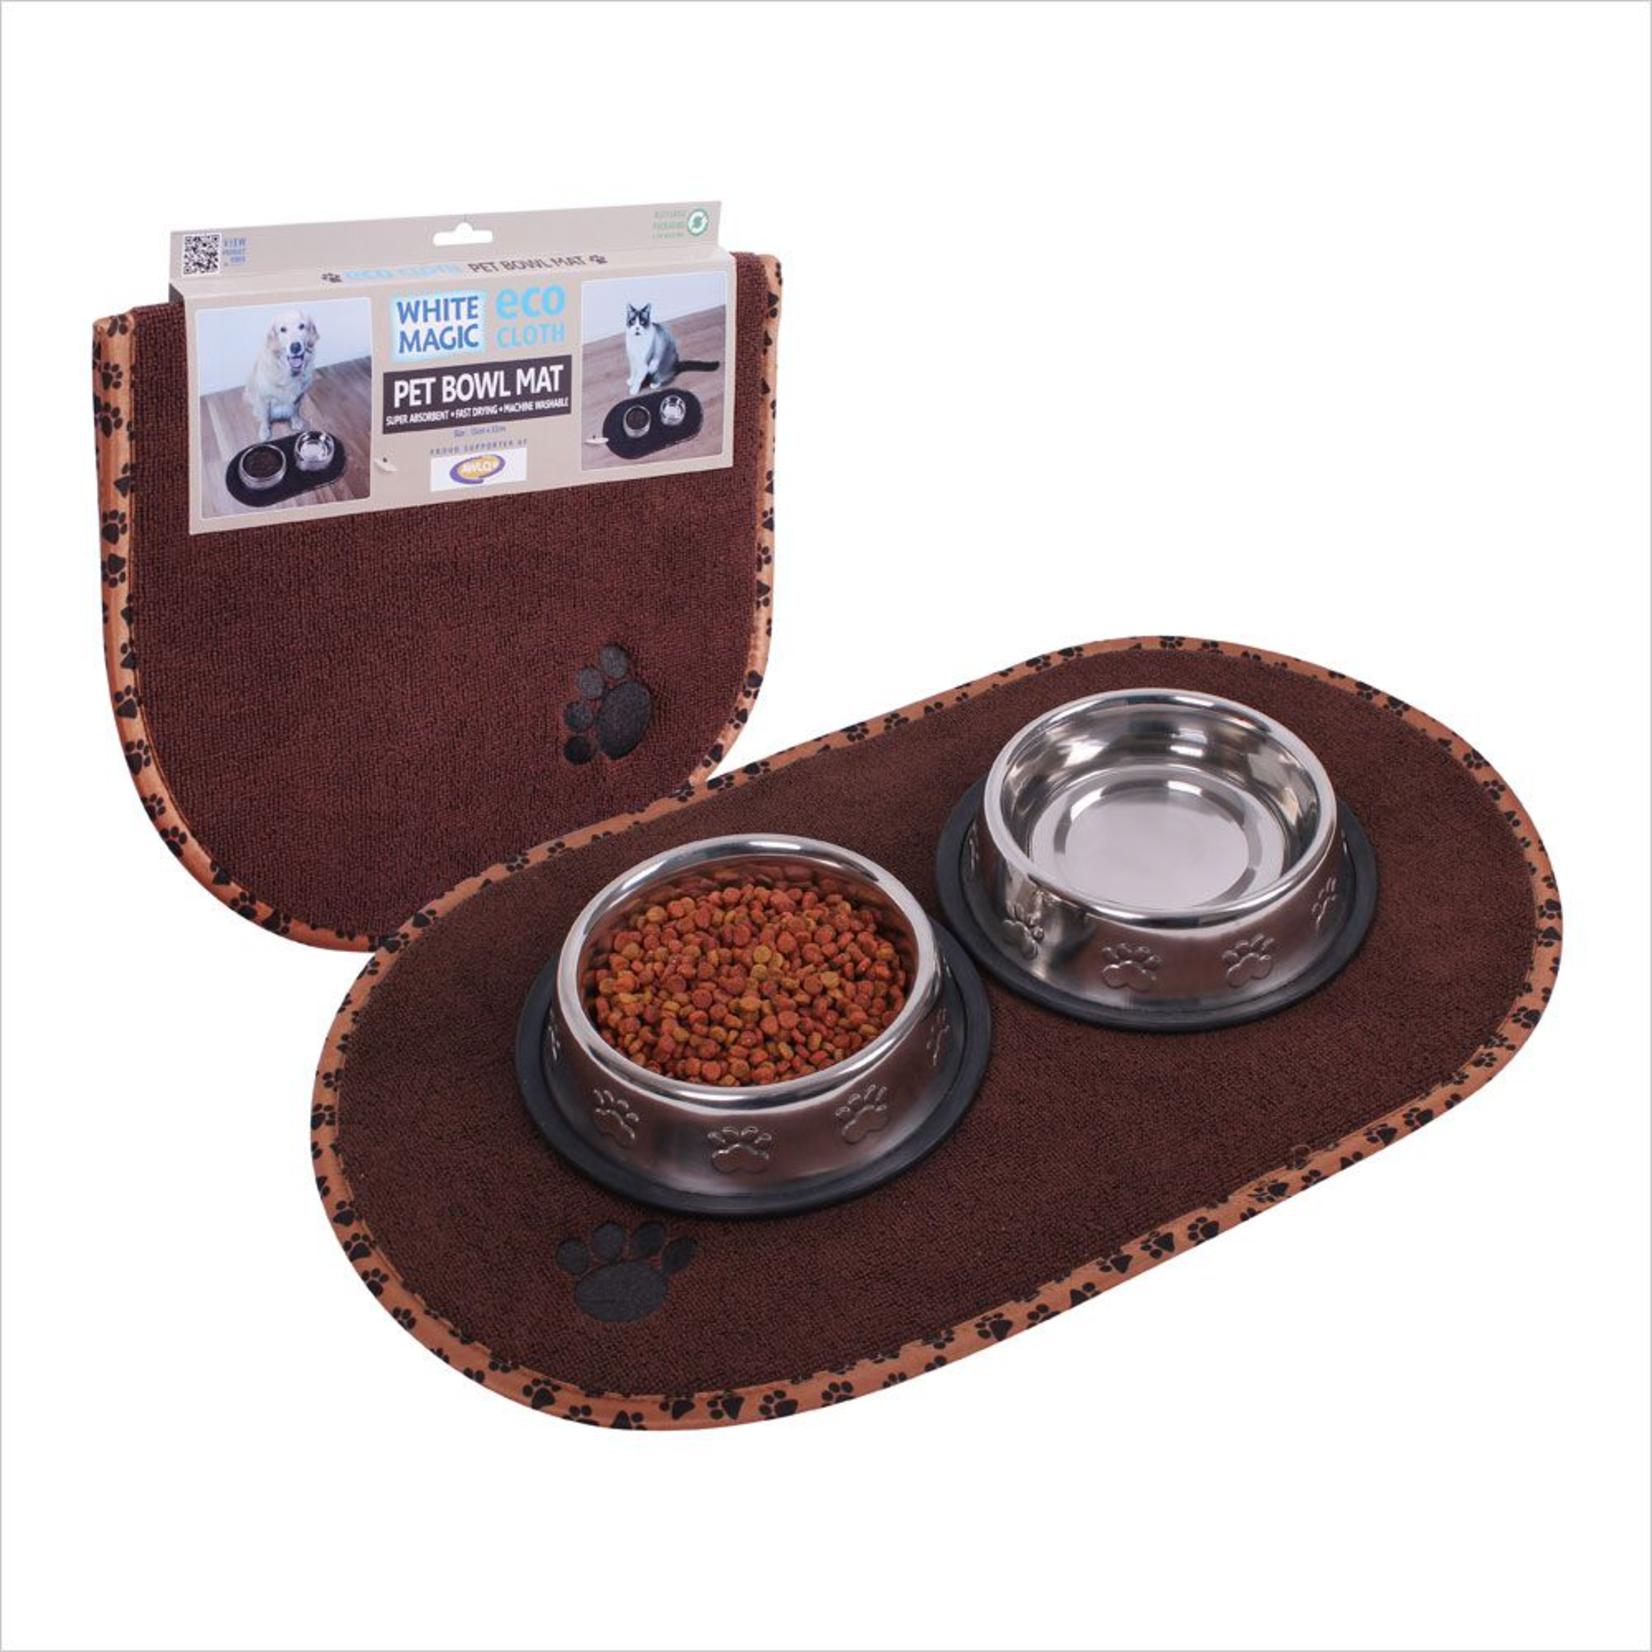 White Magic Eco Cloth Pet Bowl Mat